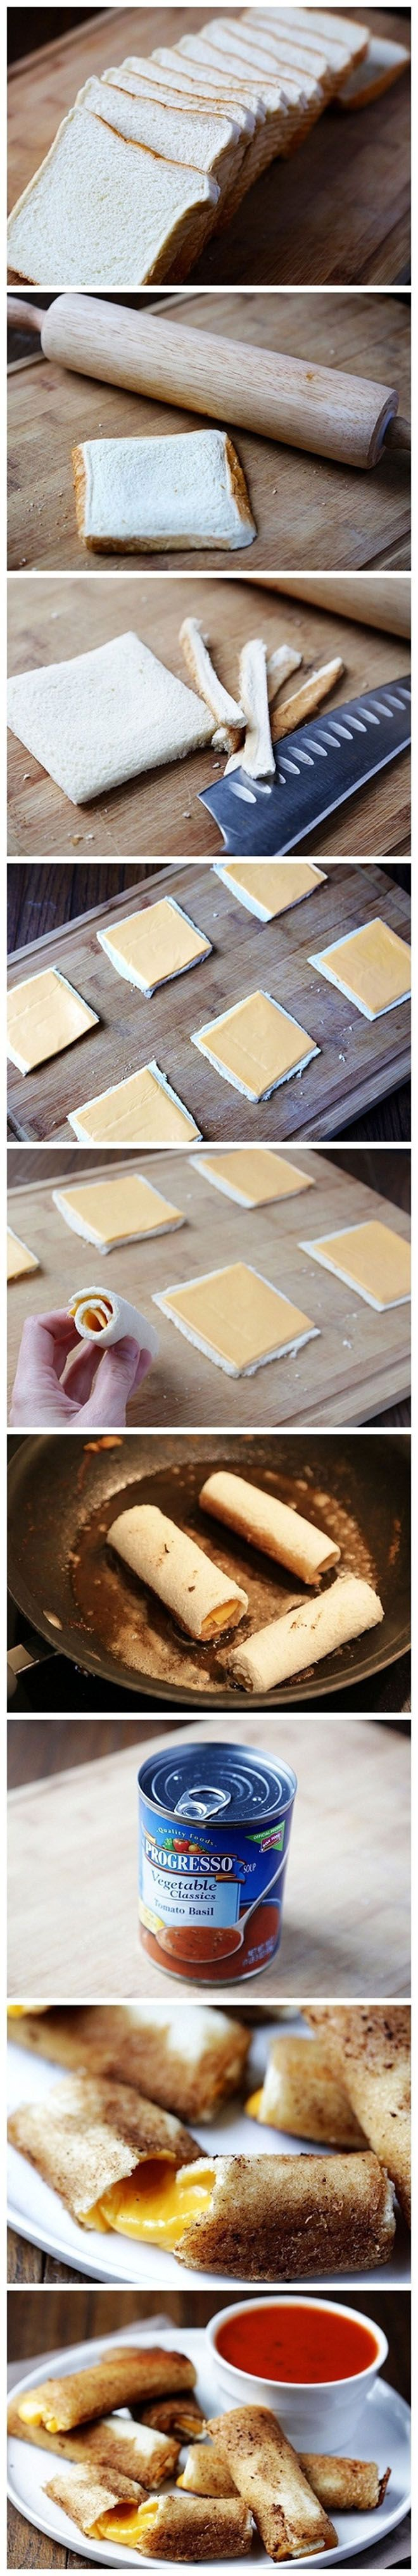 Easy cheese sticks | Savory & snacks recipes (SSR) | Pinterest